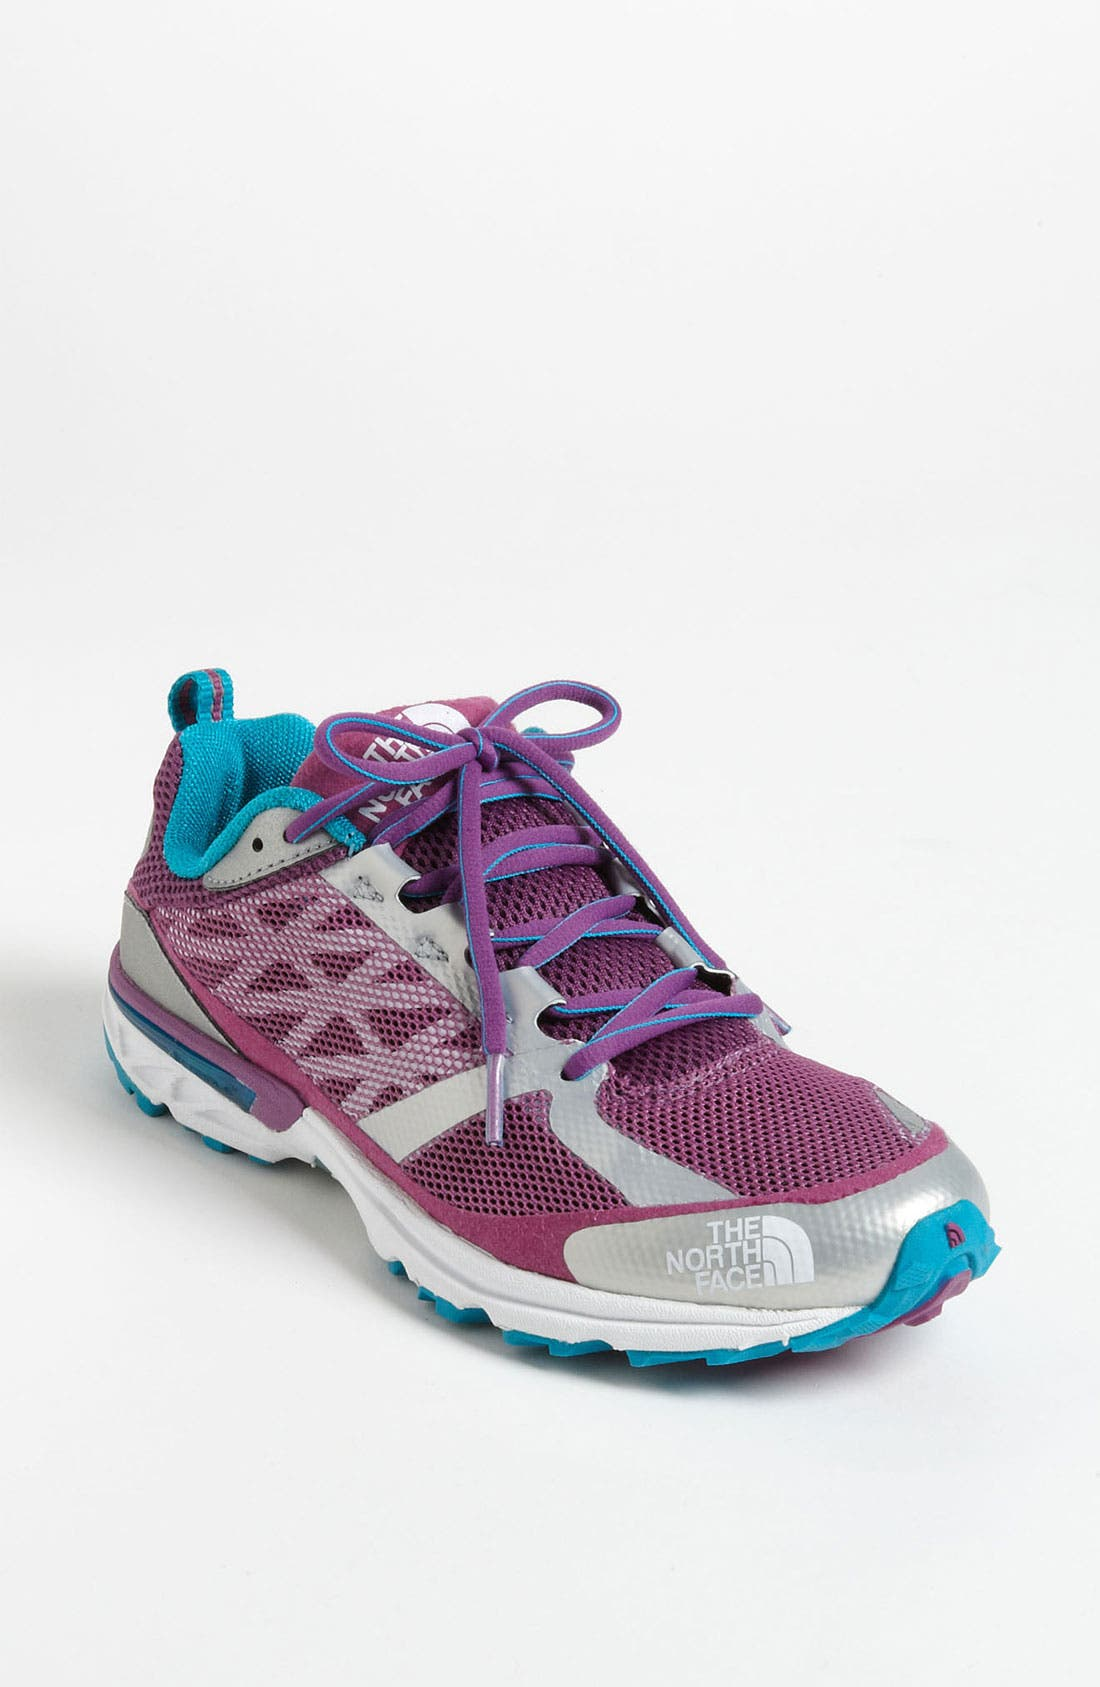 Main Image - The North Face 'Single-Track Hayasa' Trail Running Shoe (Women)